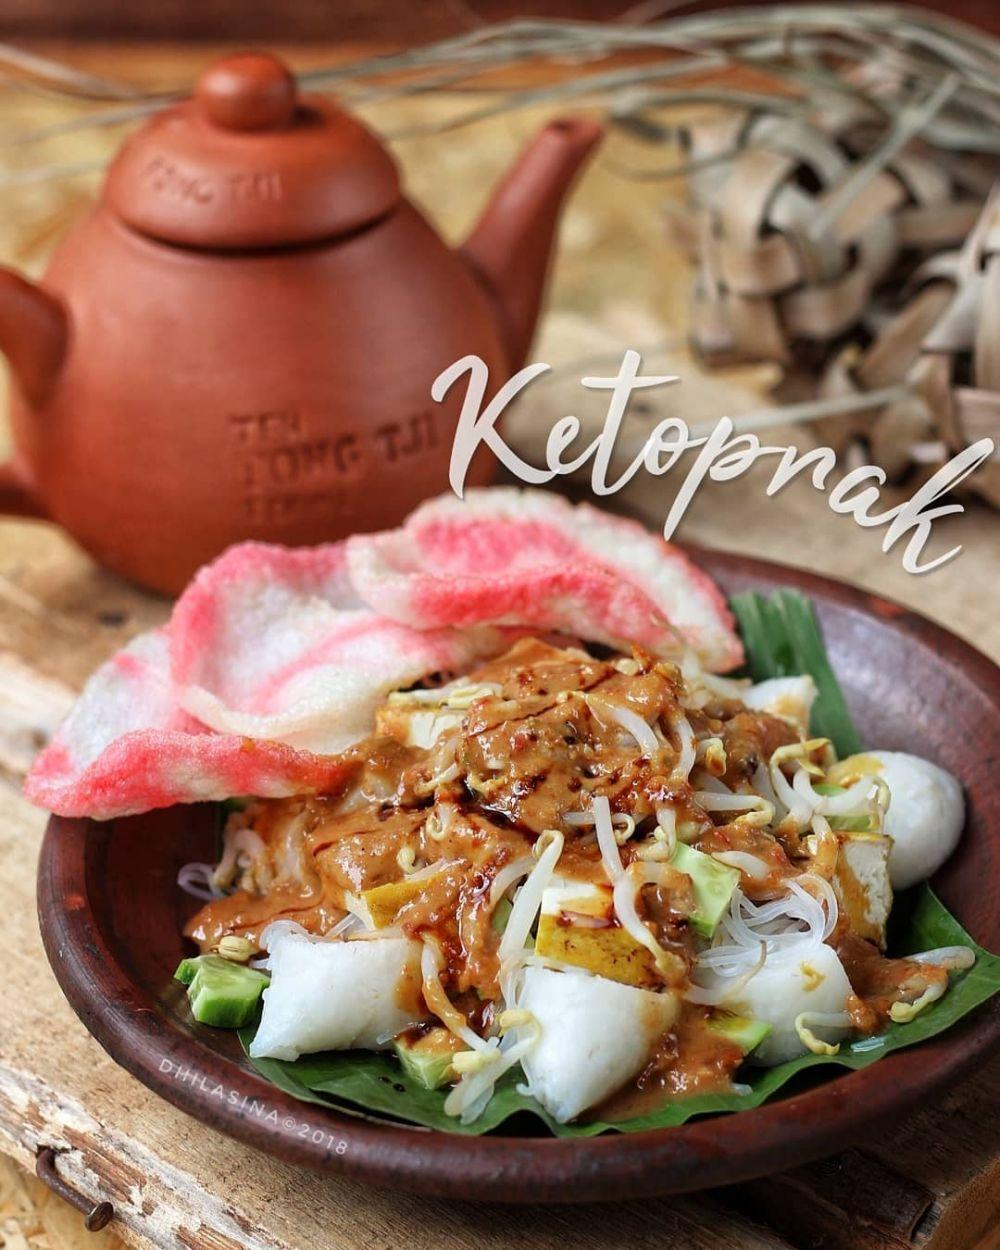 Resep Tahu Khas Daerah Berbagai Sumber Di 2020 Resep Masakan Resep Masakan Indonesia Resep Makanan